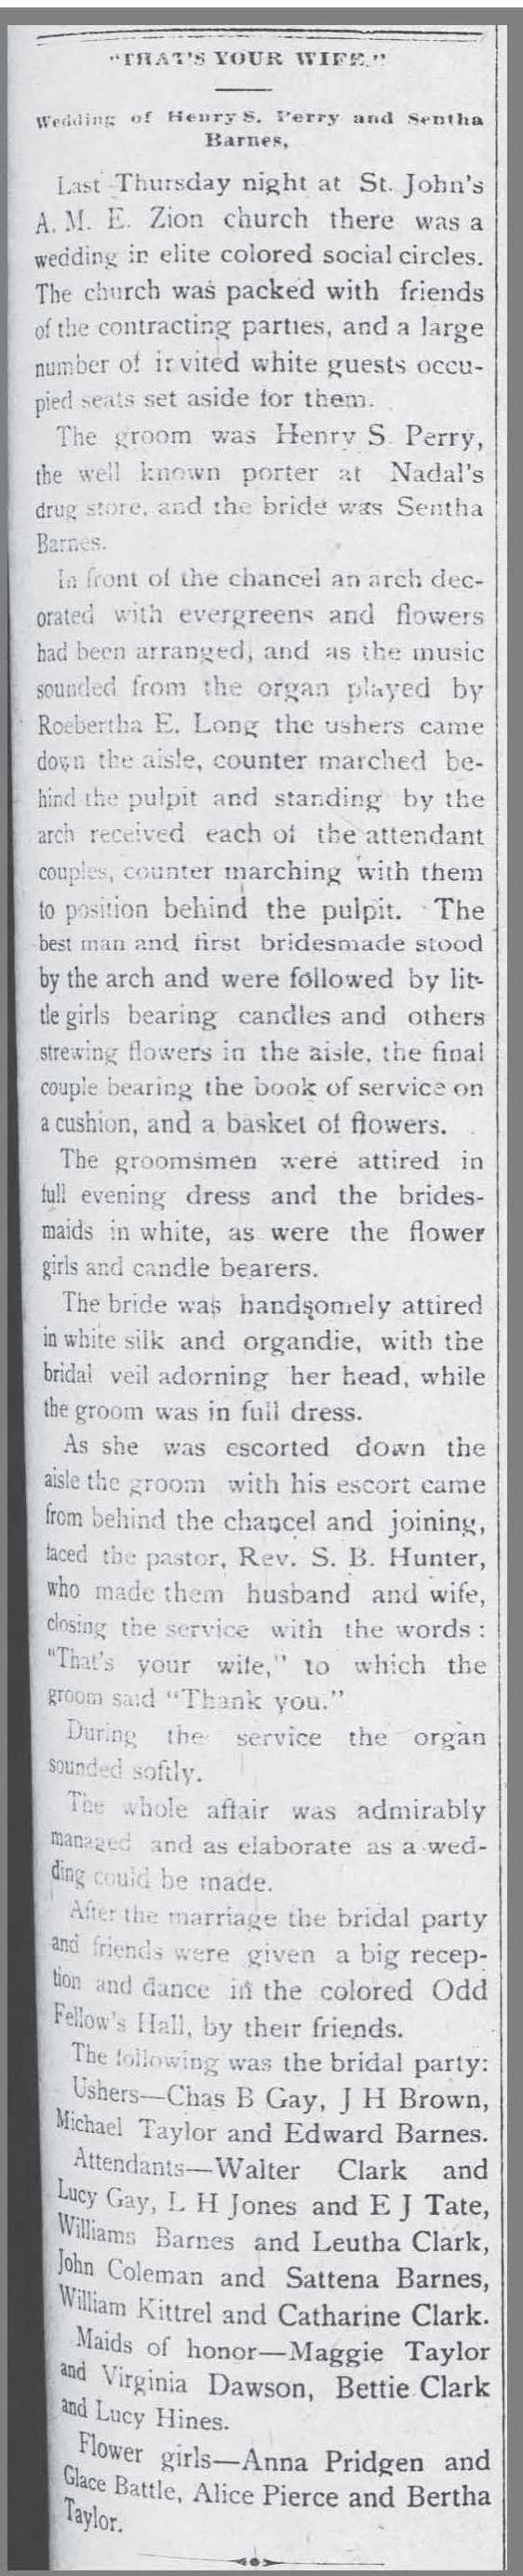 Wilson_News_9_21_1899_wedding